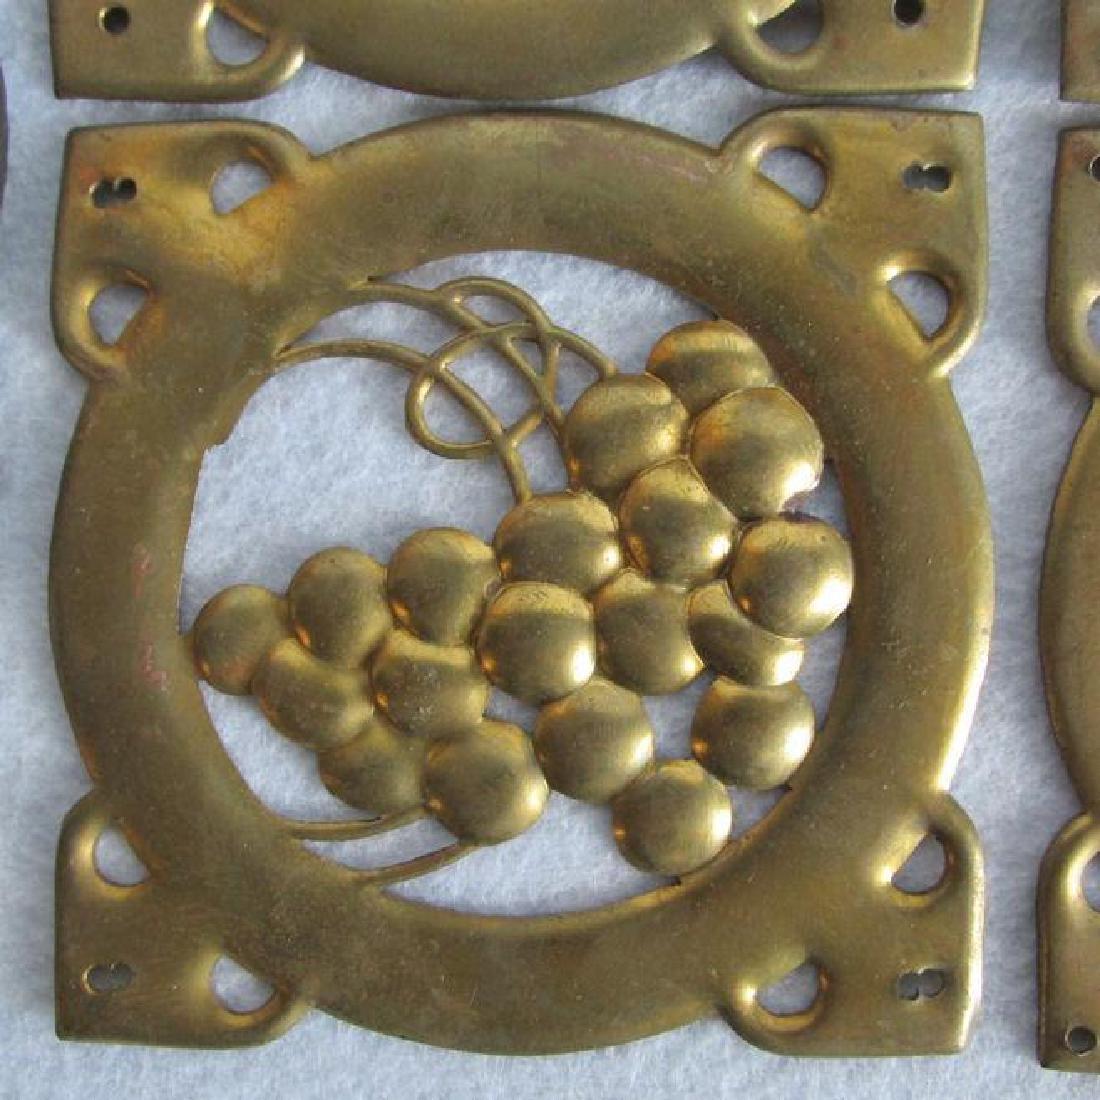 10 Arts & Crafts, Mission Brass Architectural Elements - 3